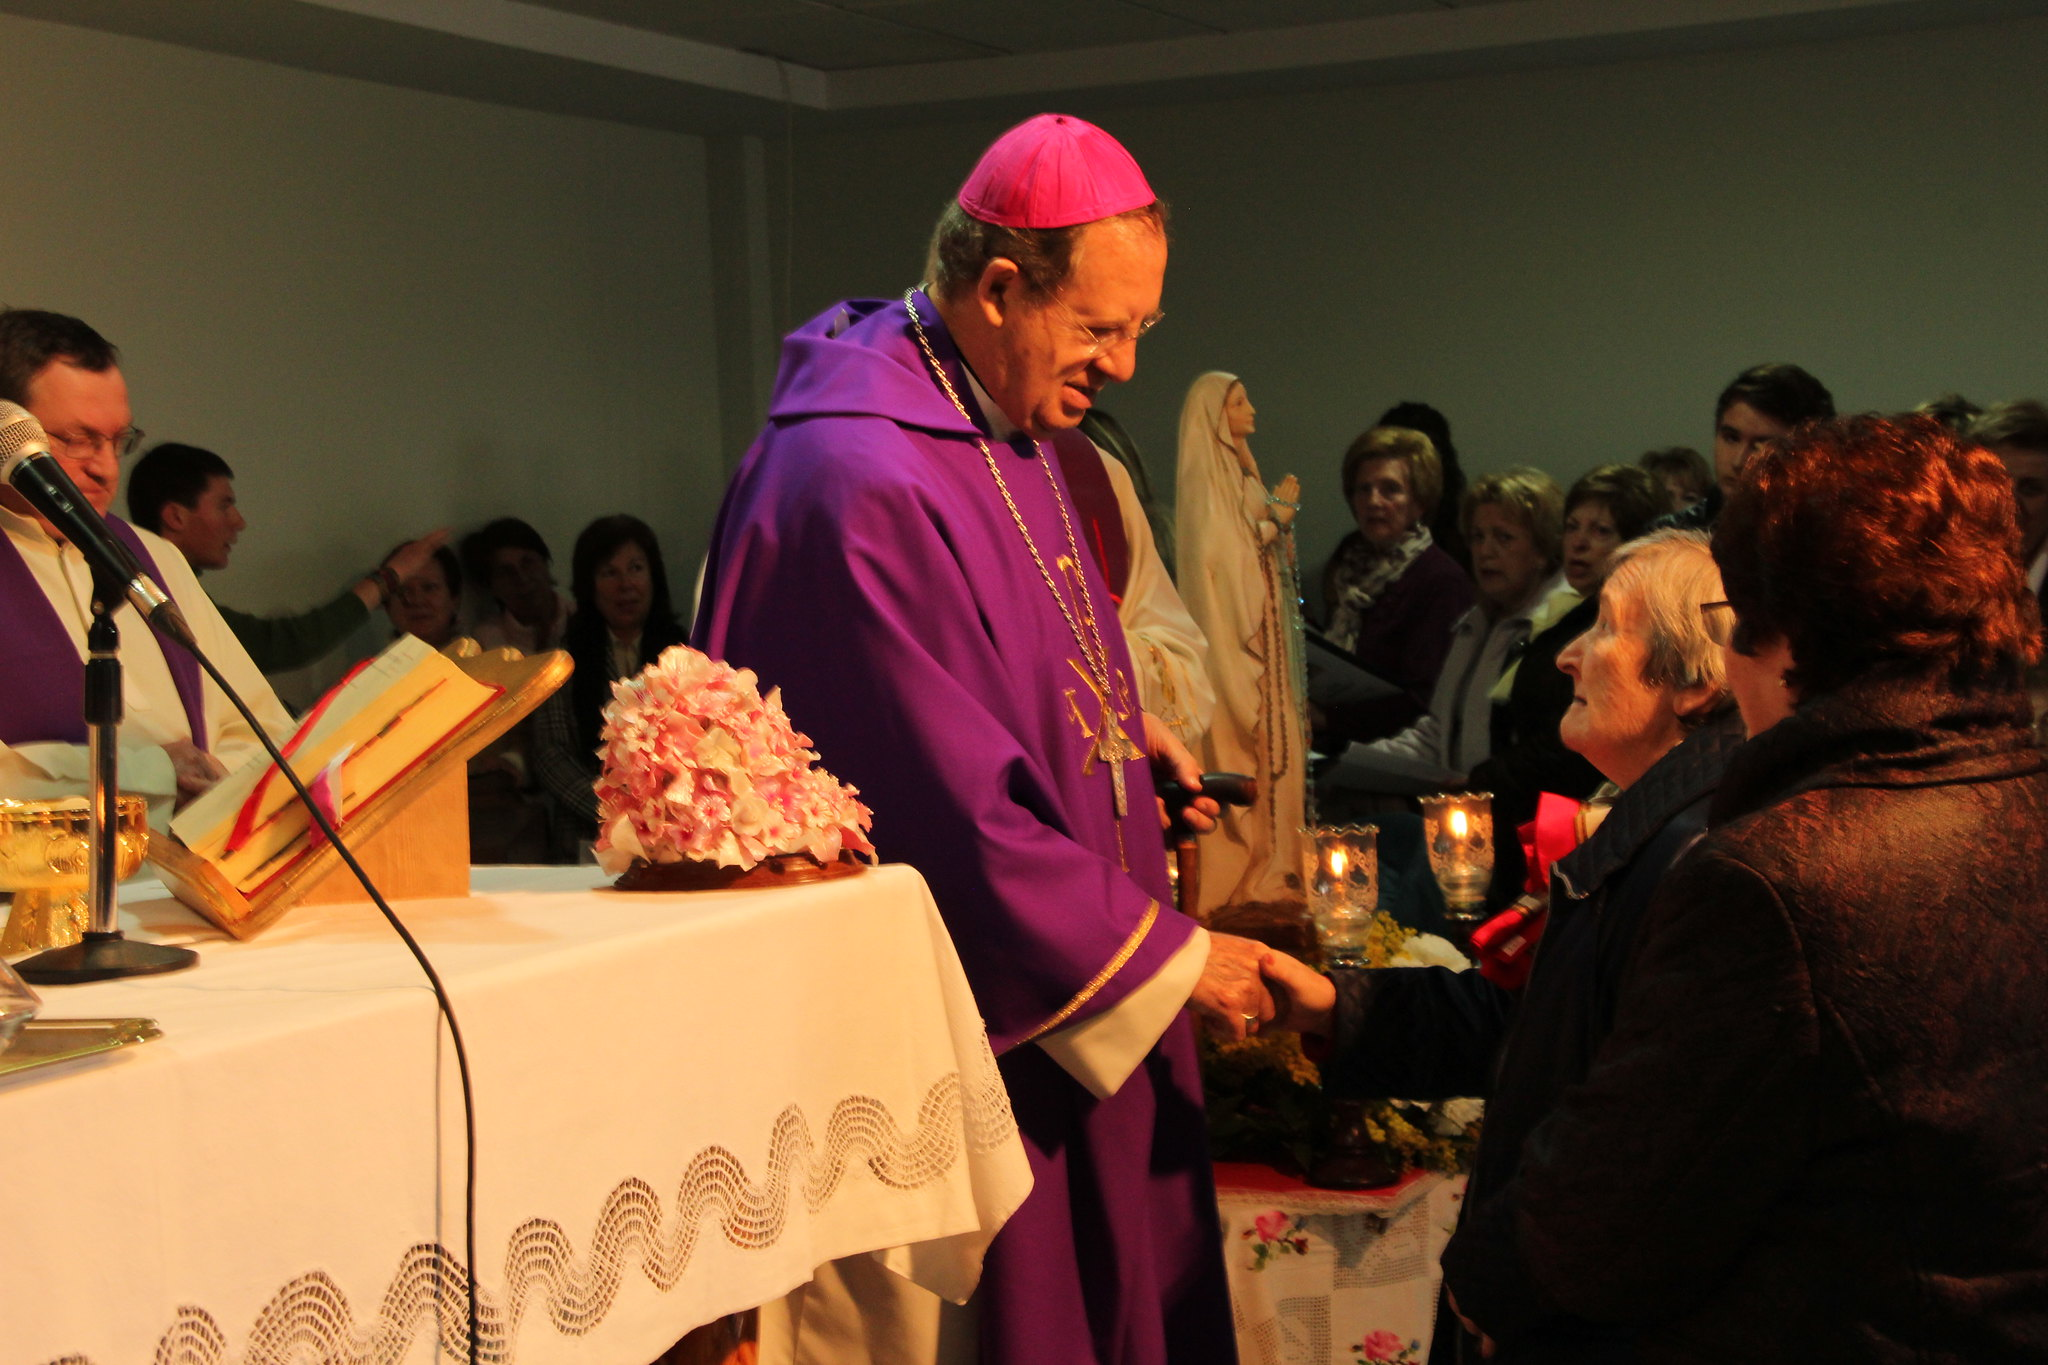 (2016-02-13) - Inauguración Virgen De Lourdes, La Molineta - Archivo La Molineta (032)